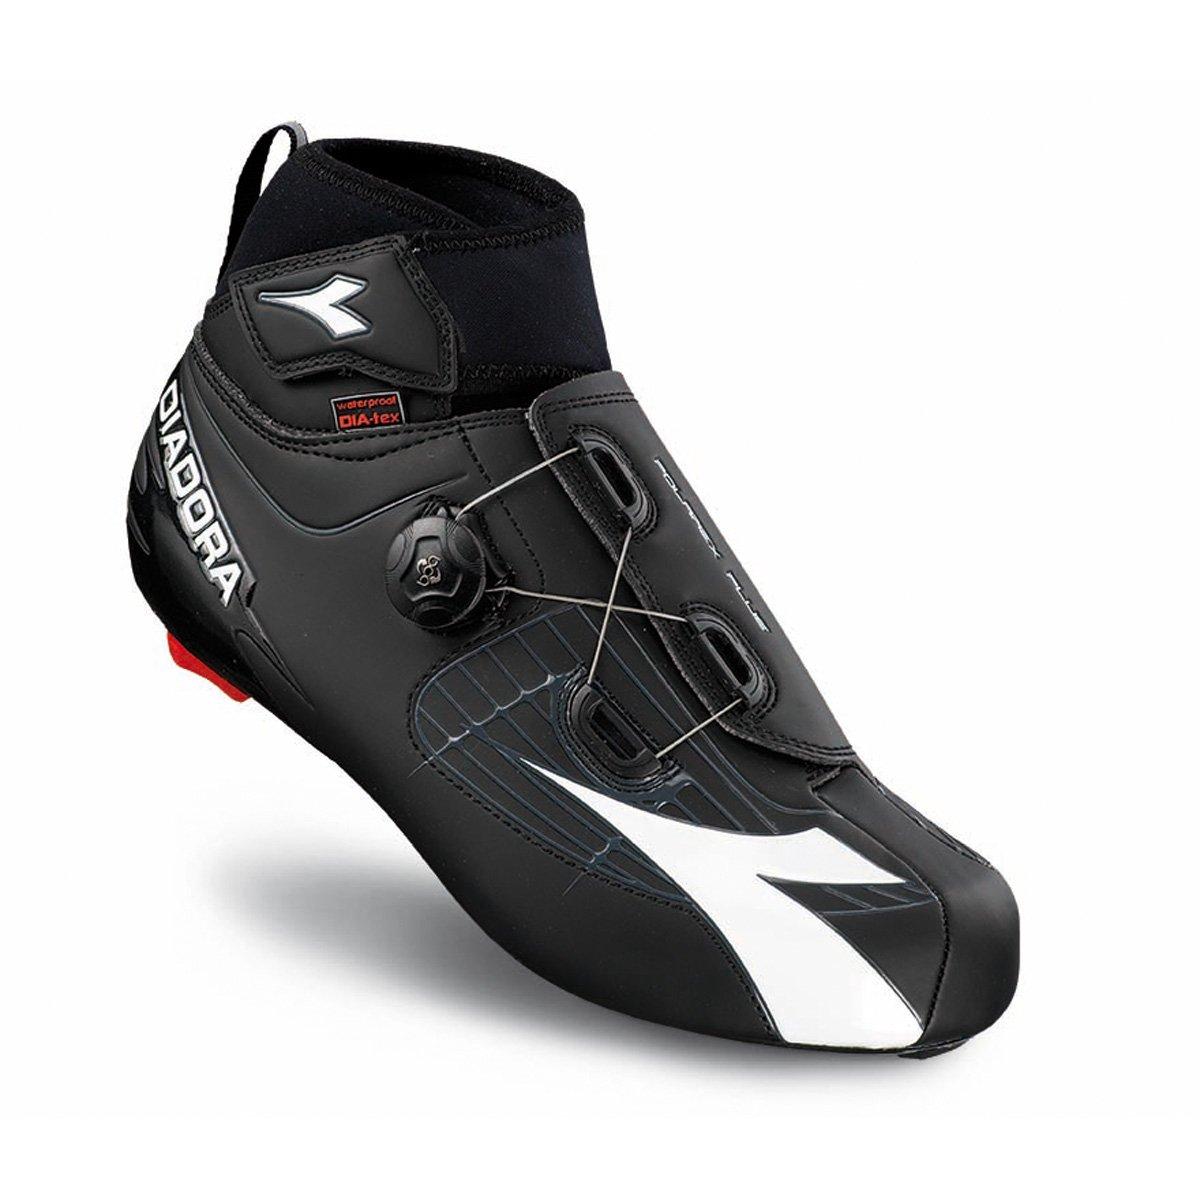 Diadora 2016メンズPolarexプラス冬道路サイクリングシューズ – 170229 45 ブラック/ホワイト B012G59EN0